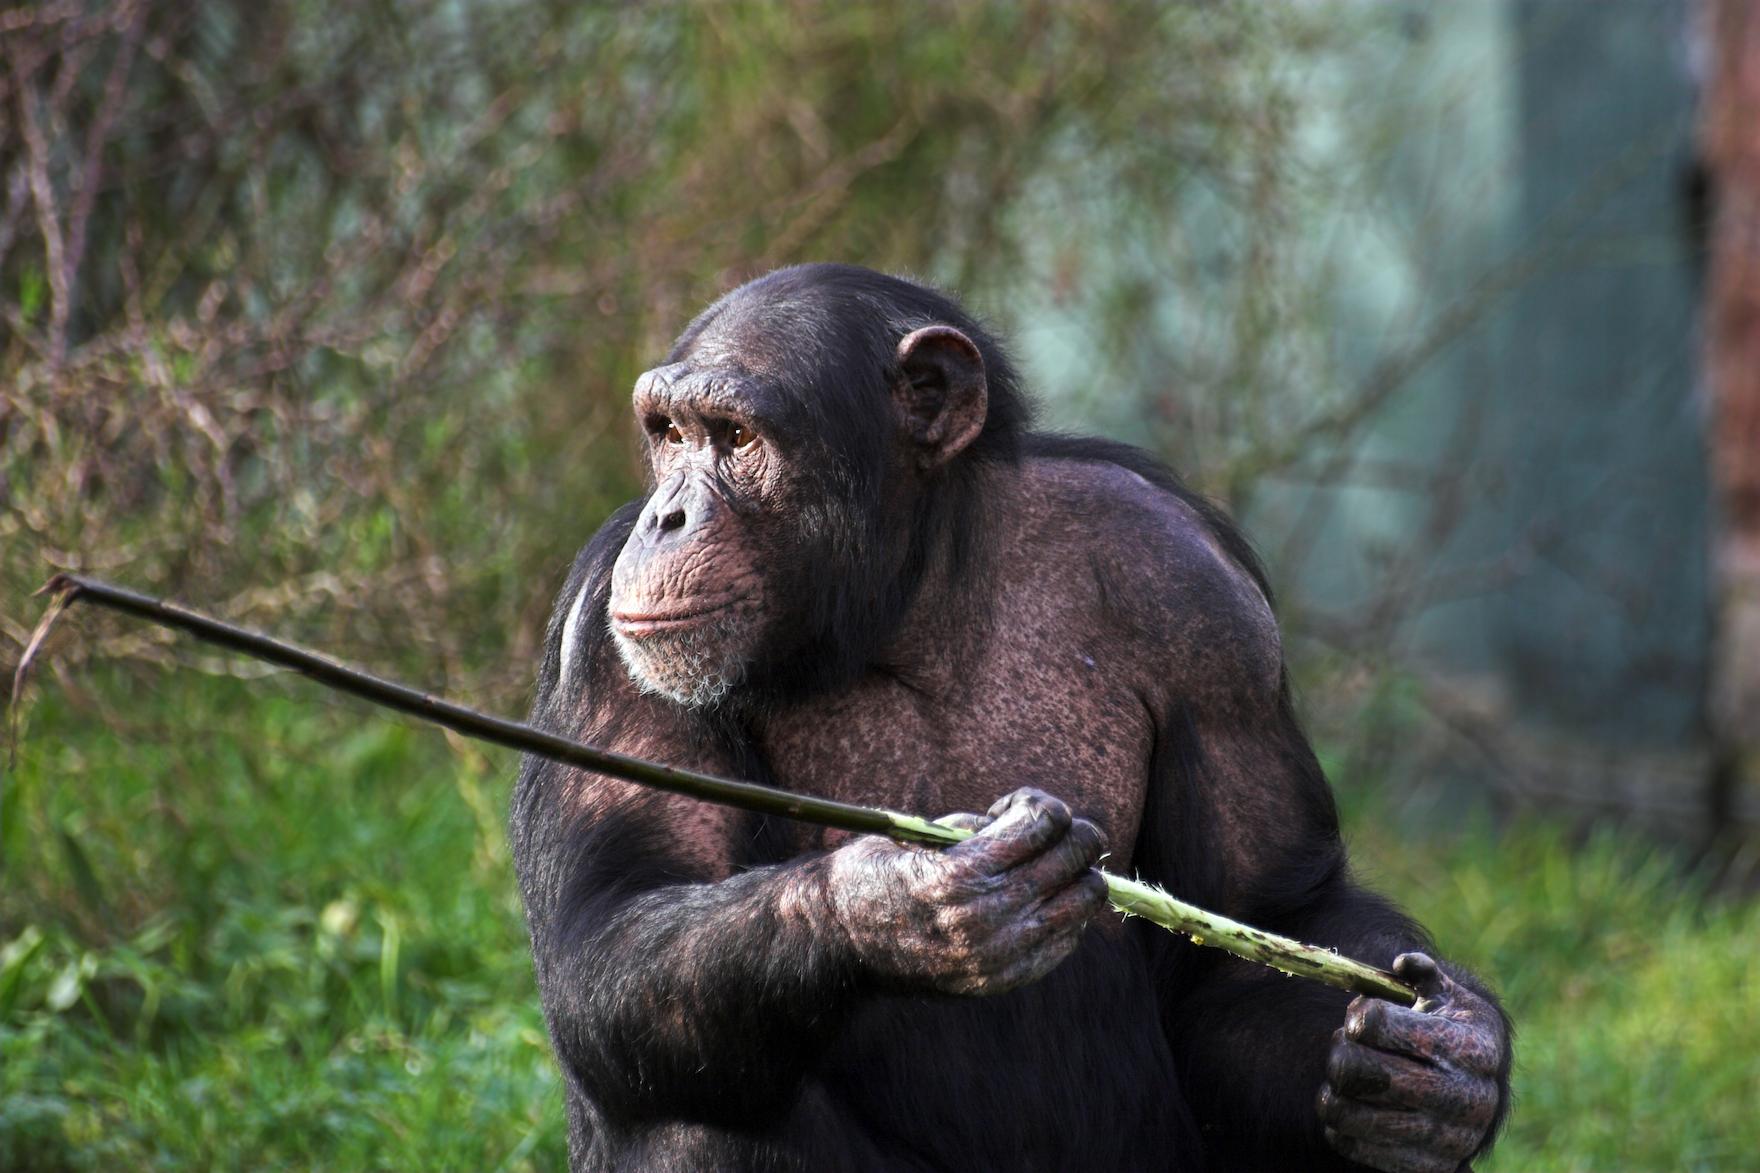 do chimpanzees have culture